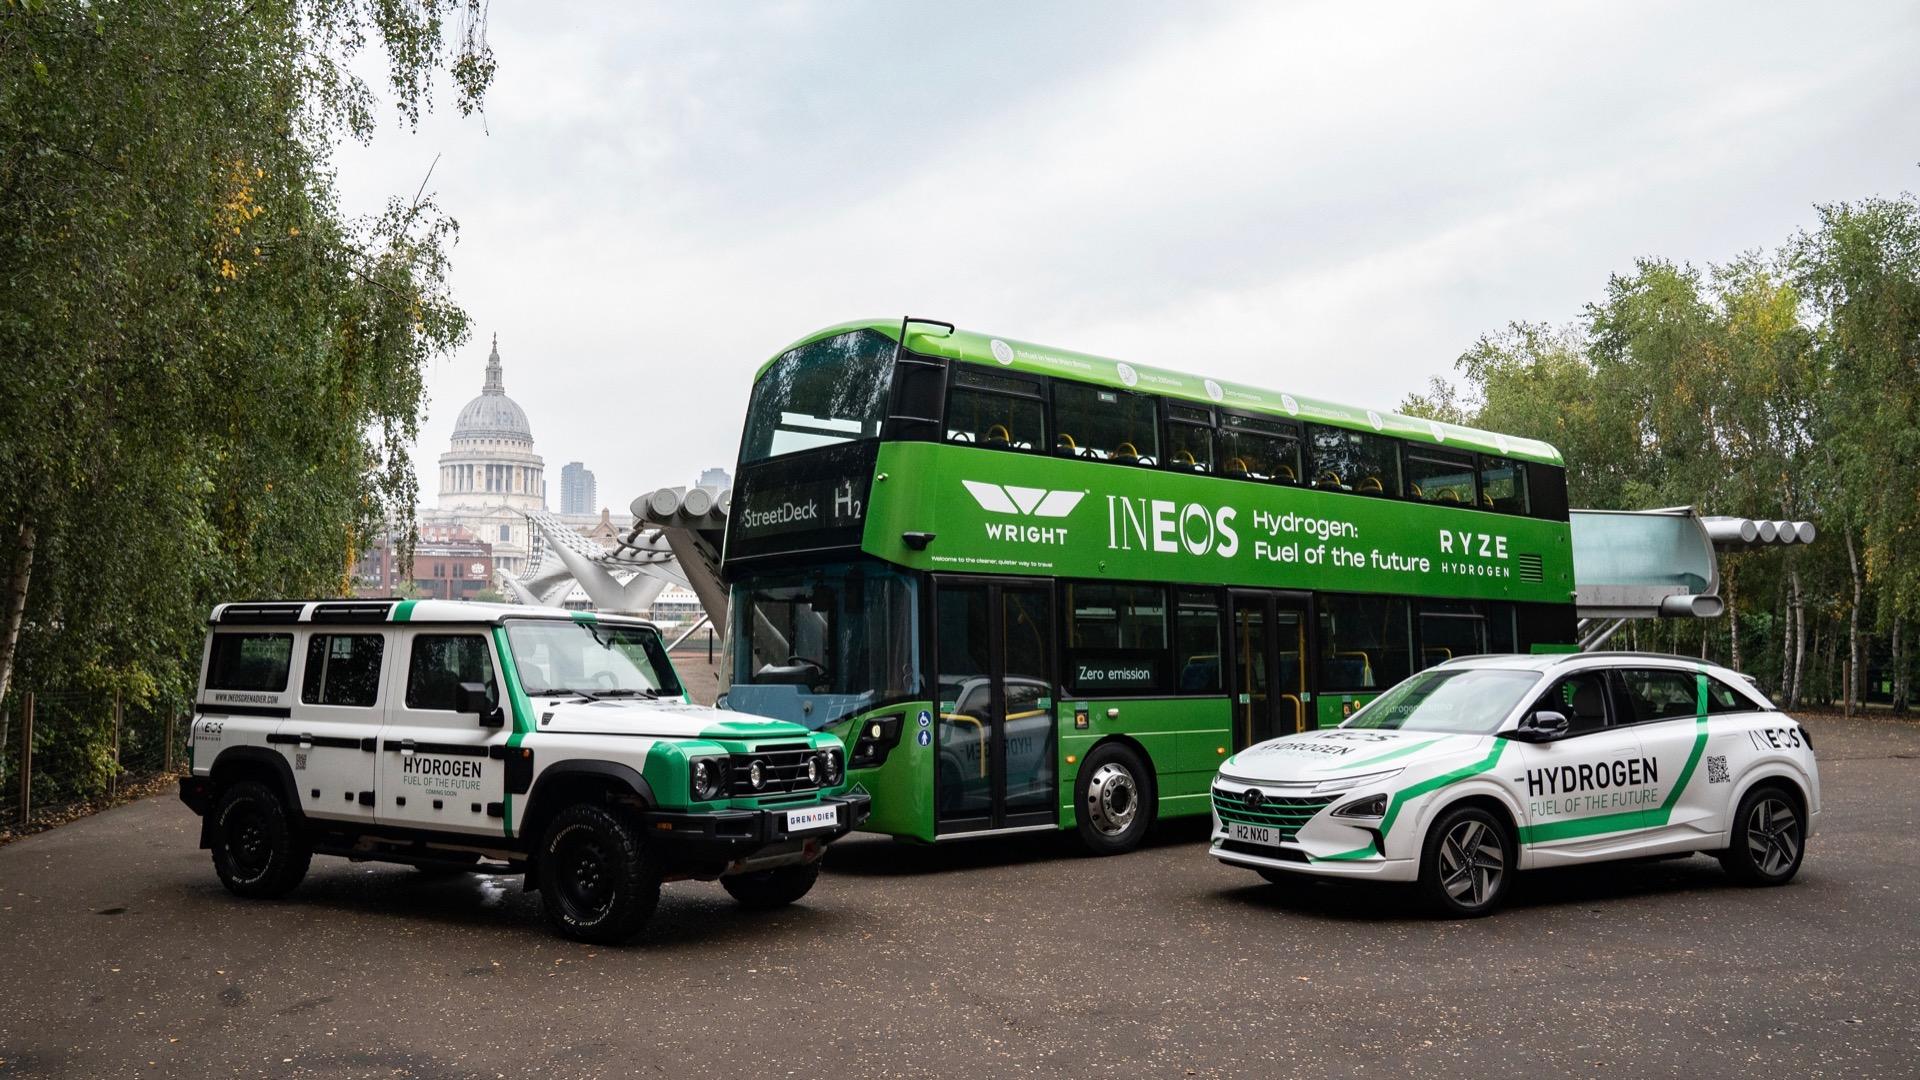 Ineos unveils fuel-cell SUV prototype, announces hydrogen production plans